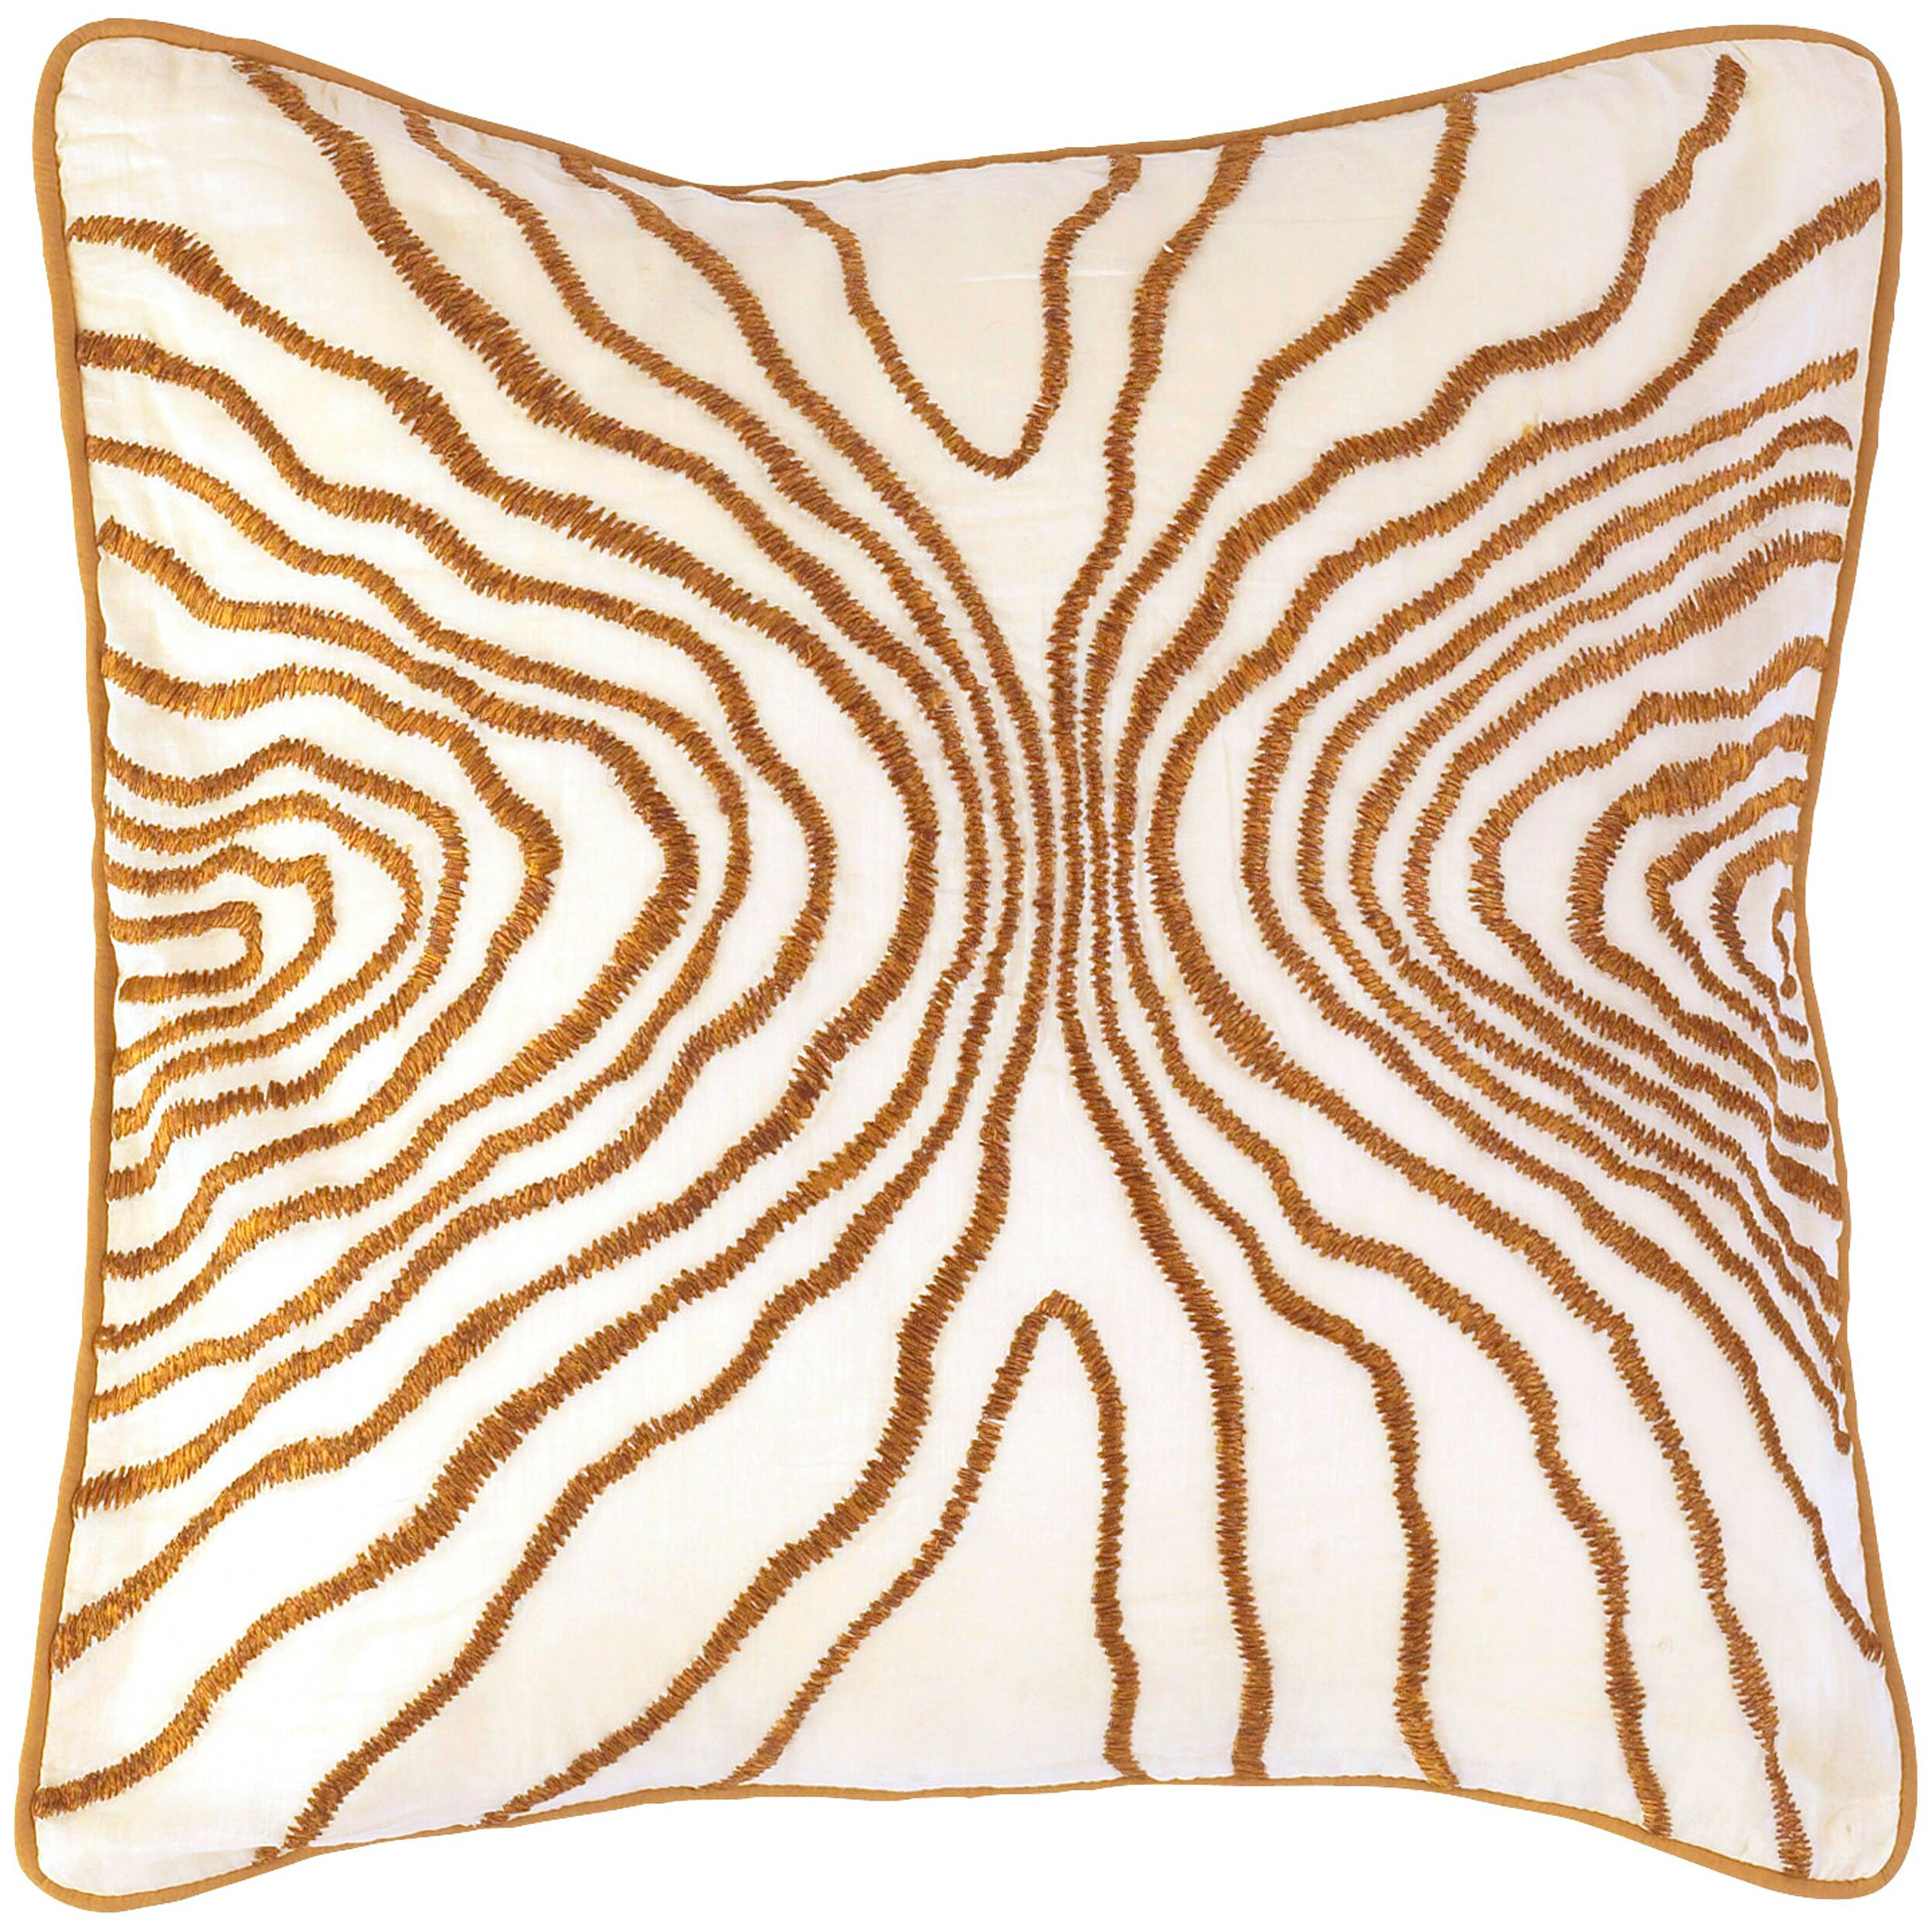 Decorative Ashland Down Pillow